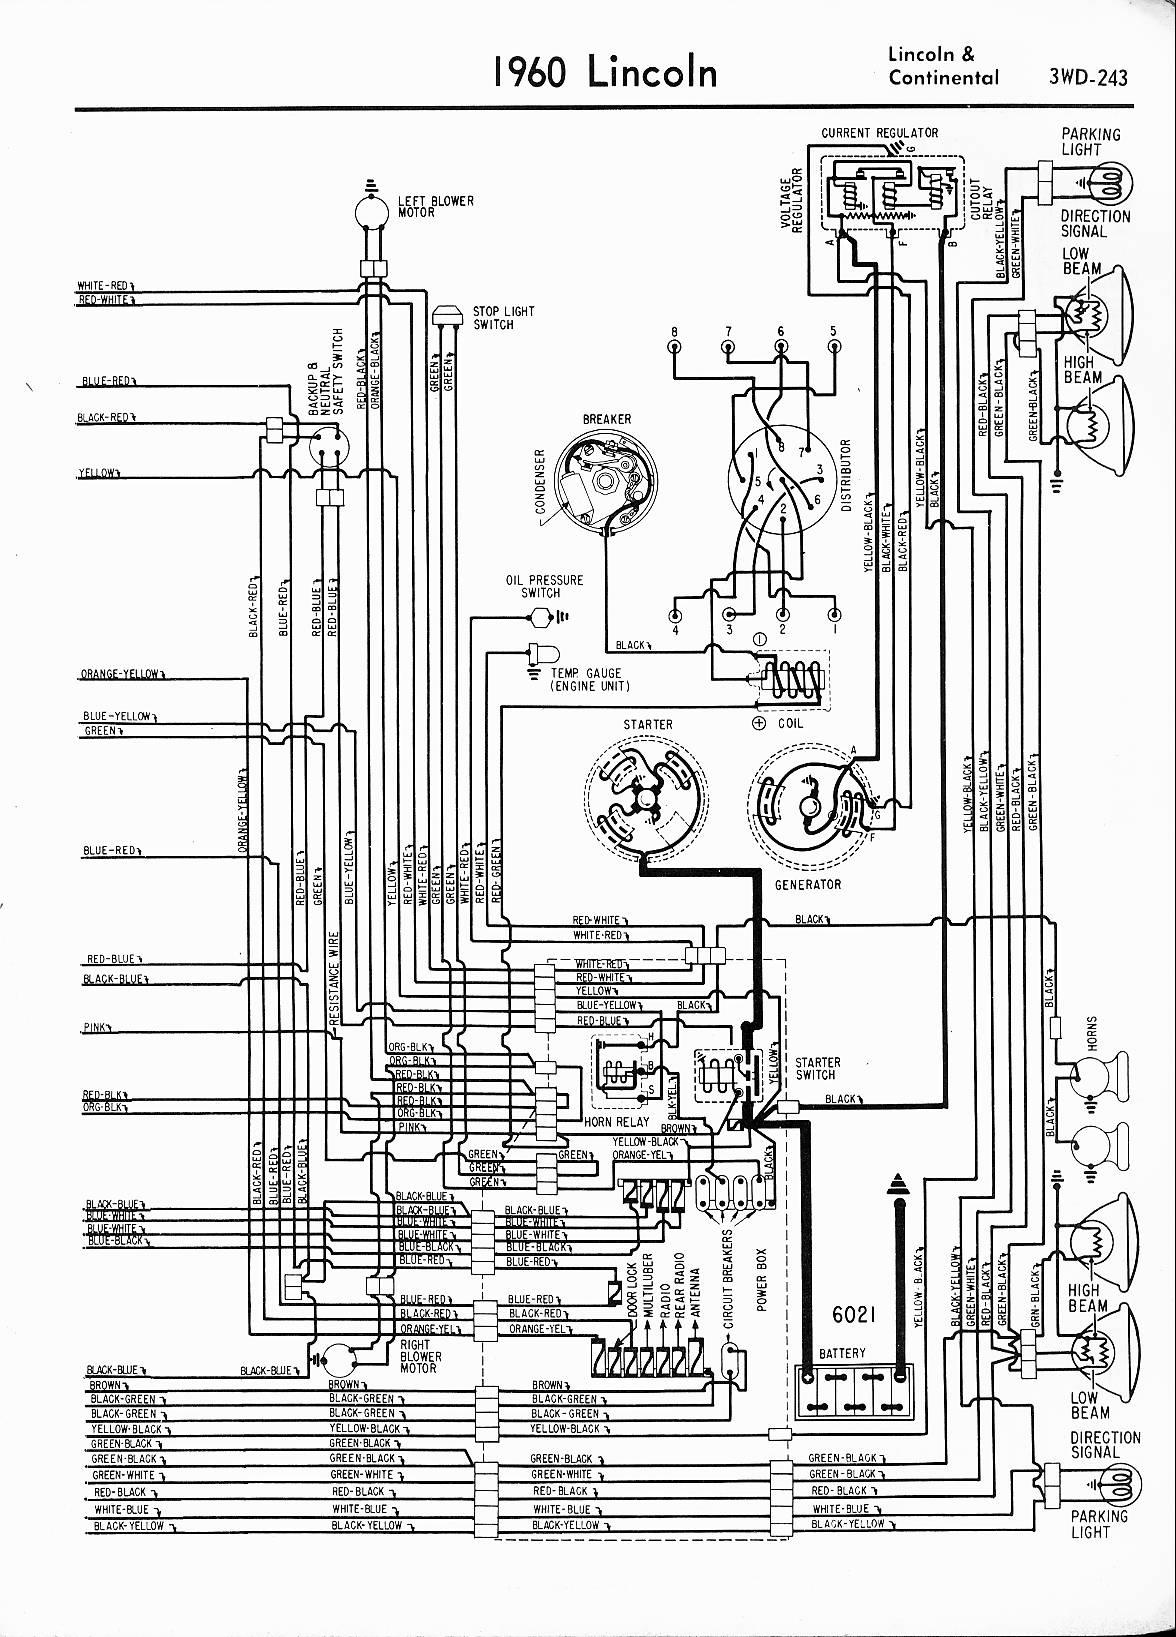 bosch dynastart wiring diagram uml swimlane lincoln vacuum library diagrams 1957 1965 rh oldcarmanualproject com 2004 navigator